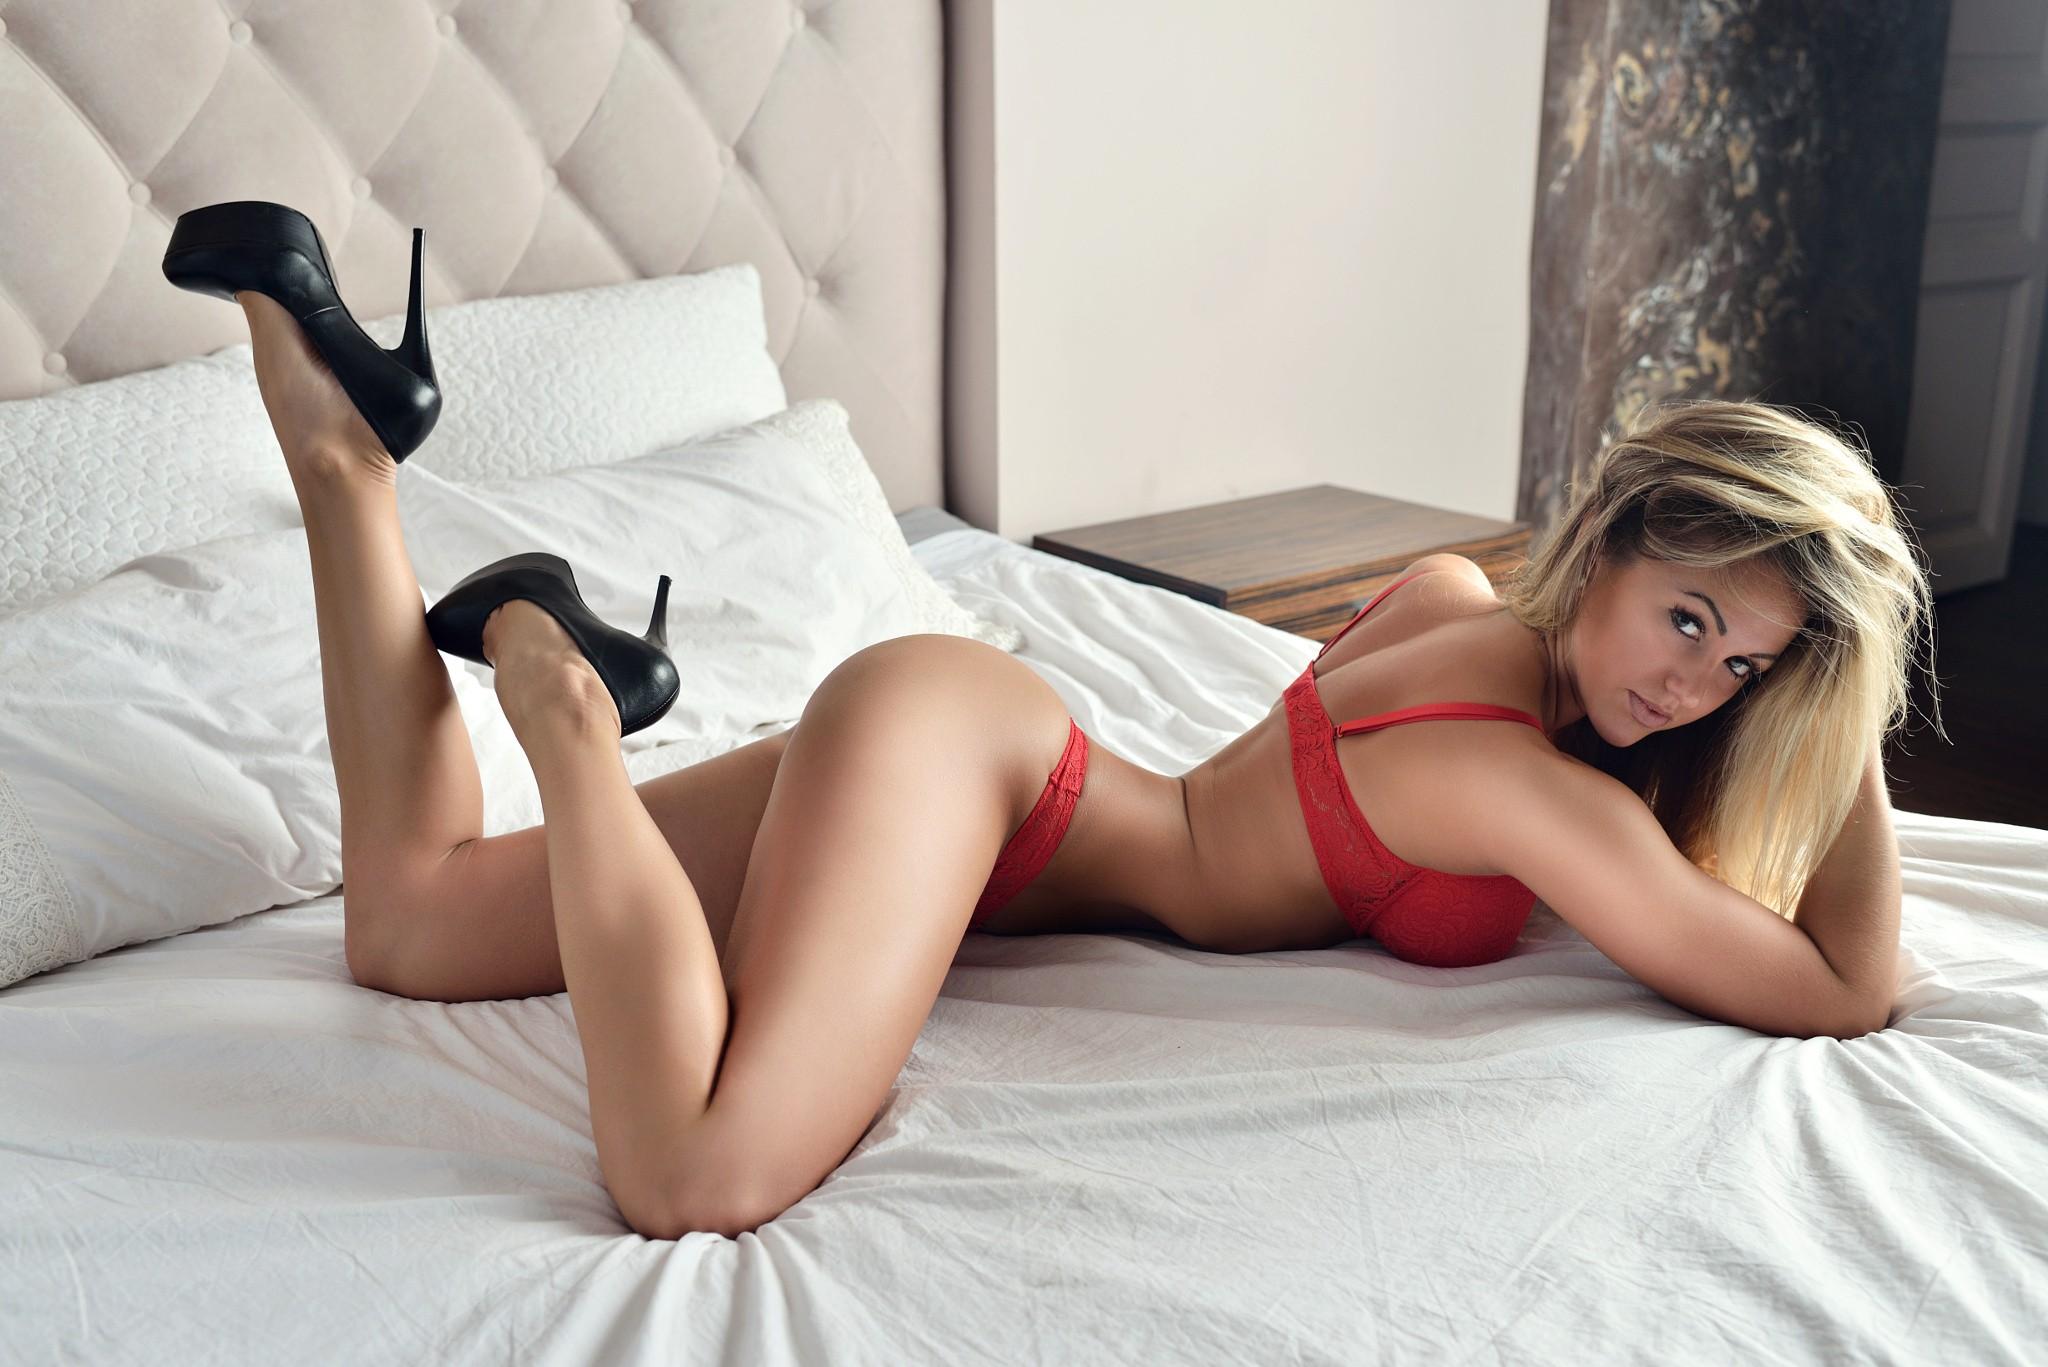 Free seductive erotica pics download hentai pics